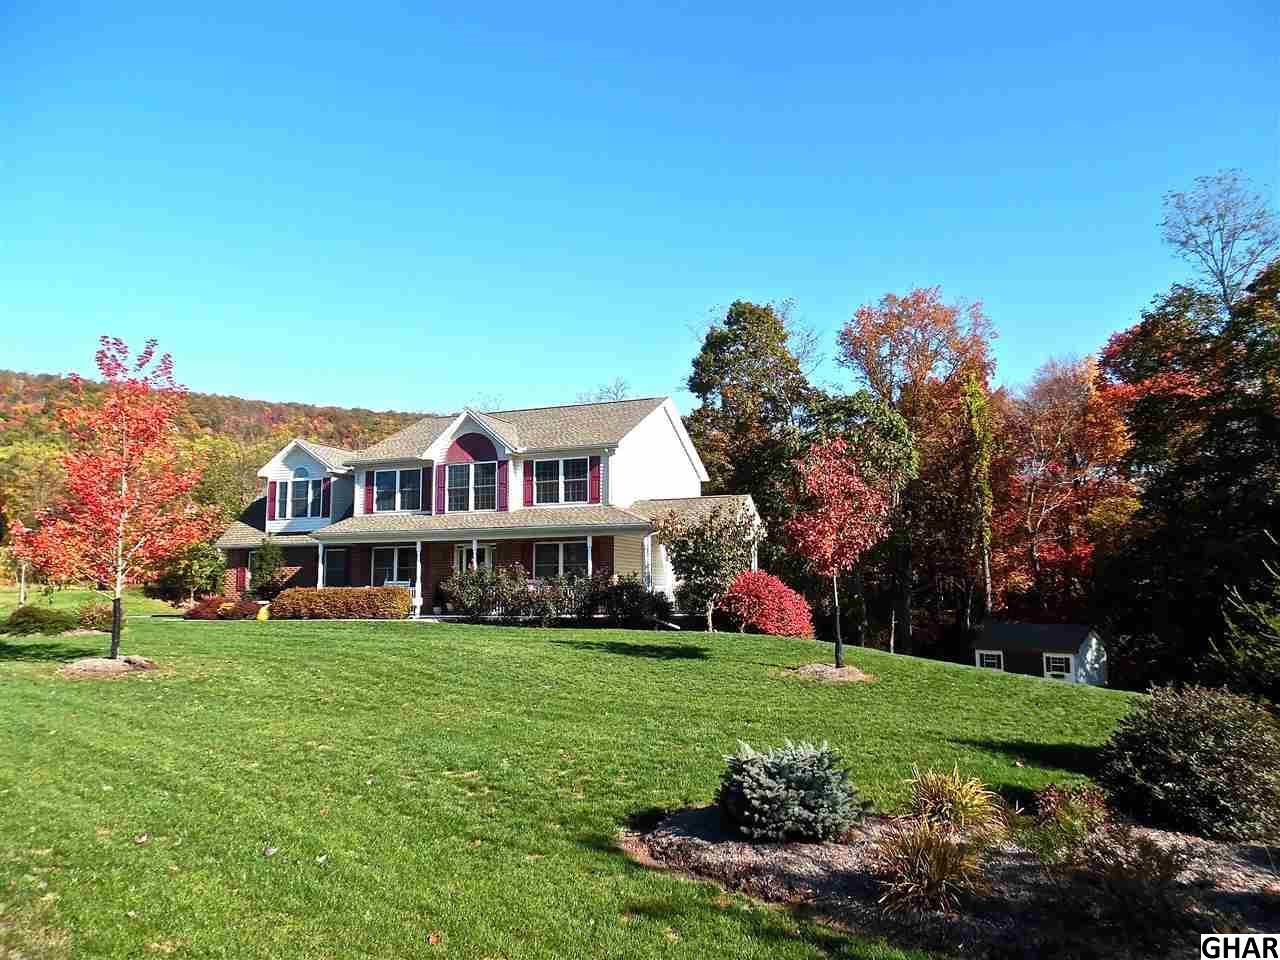 Real Estate for Sale, ListingId: 34417173, Dauphin,PA17018